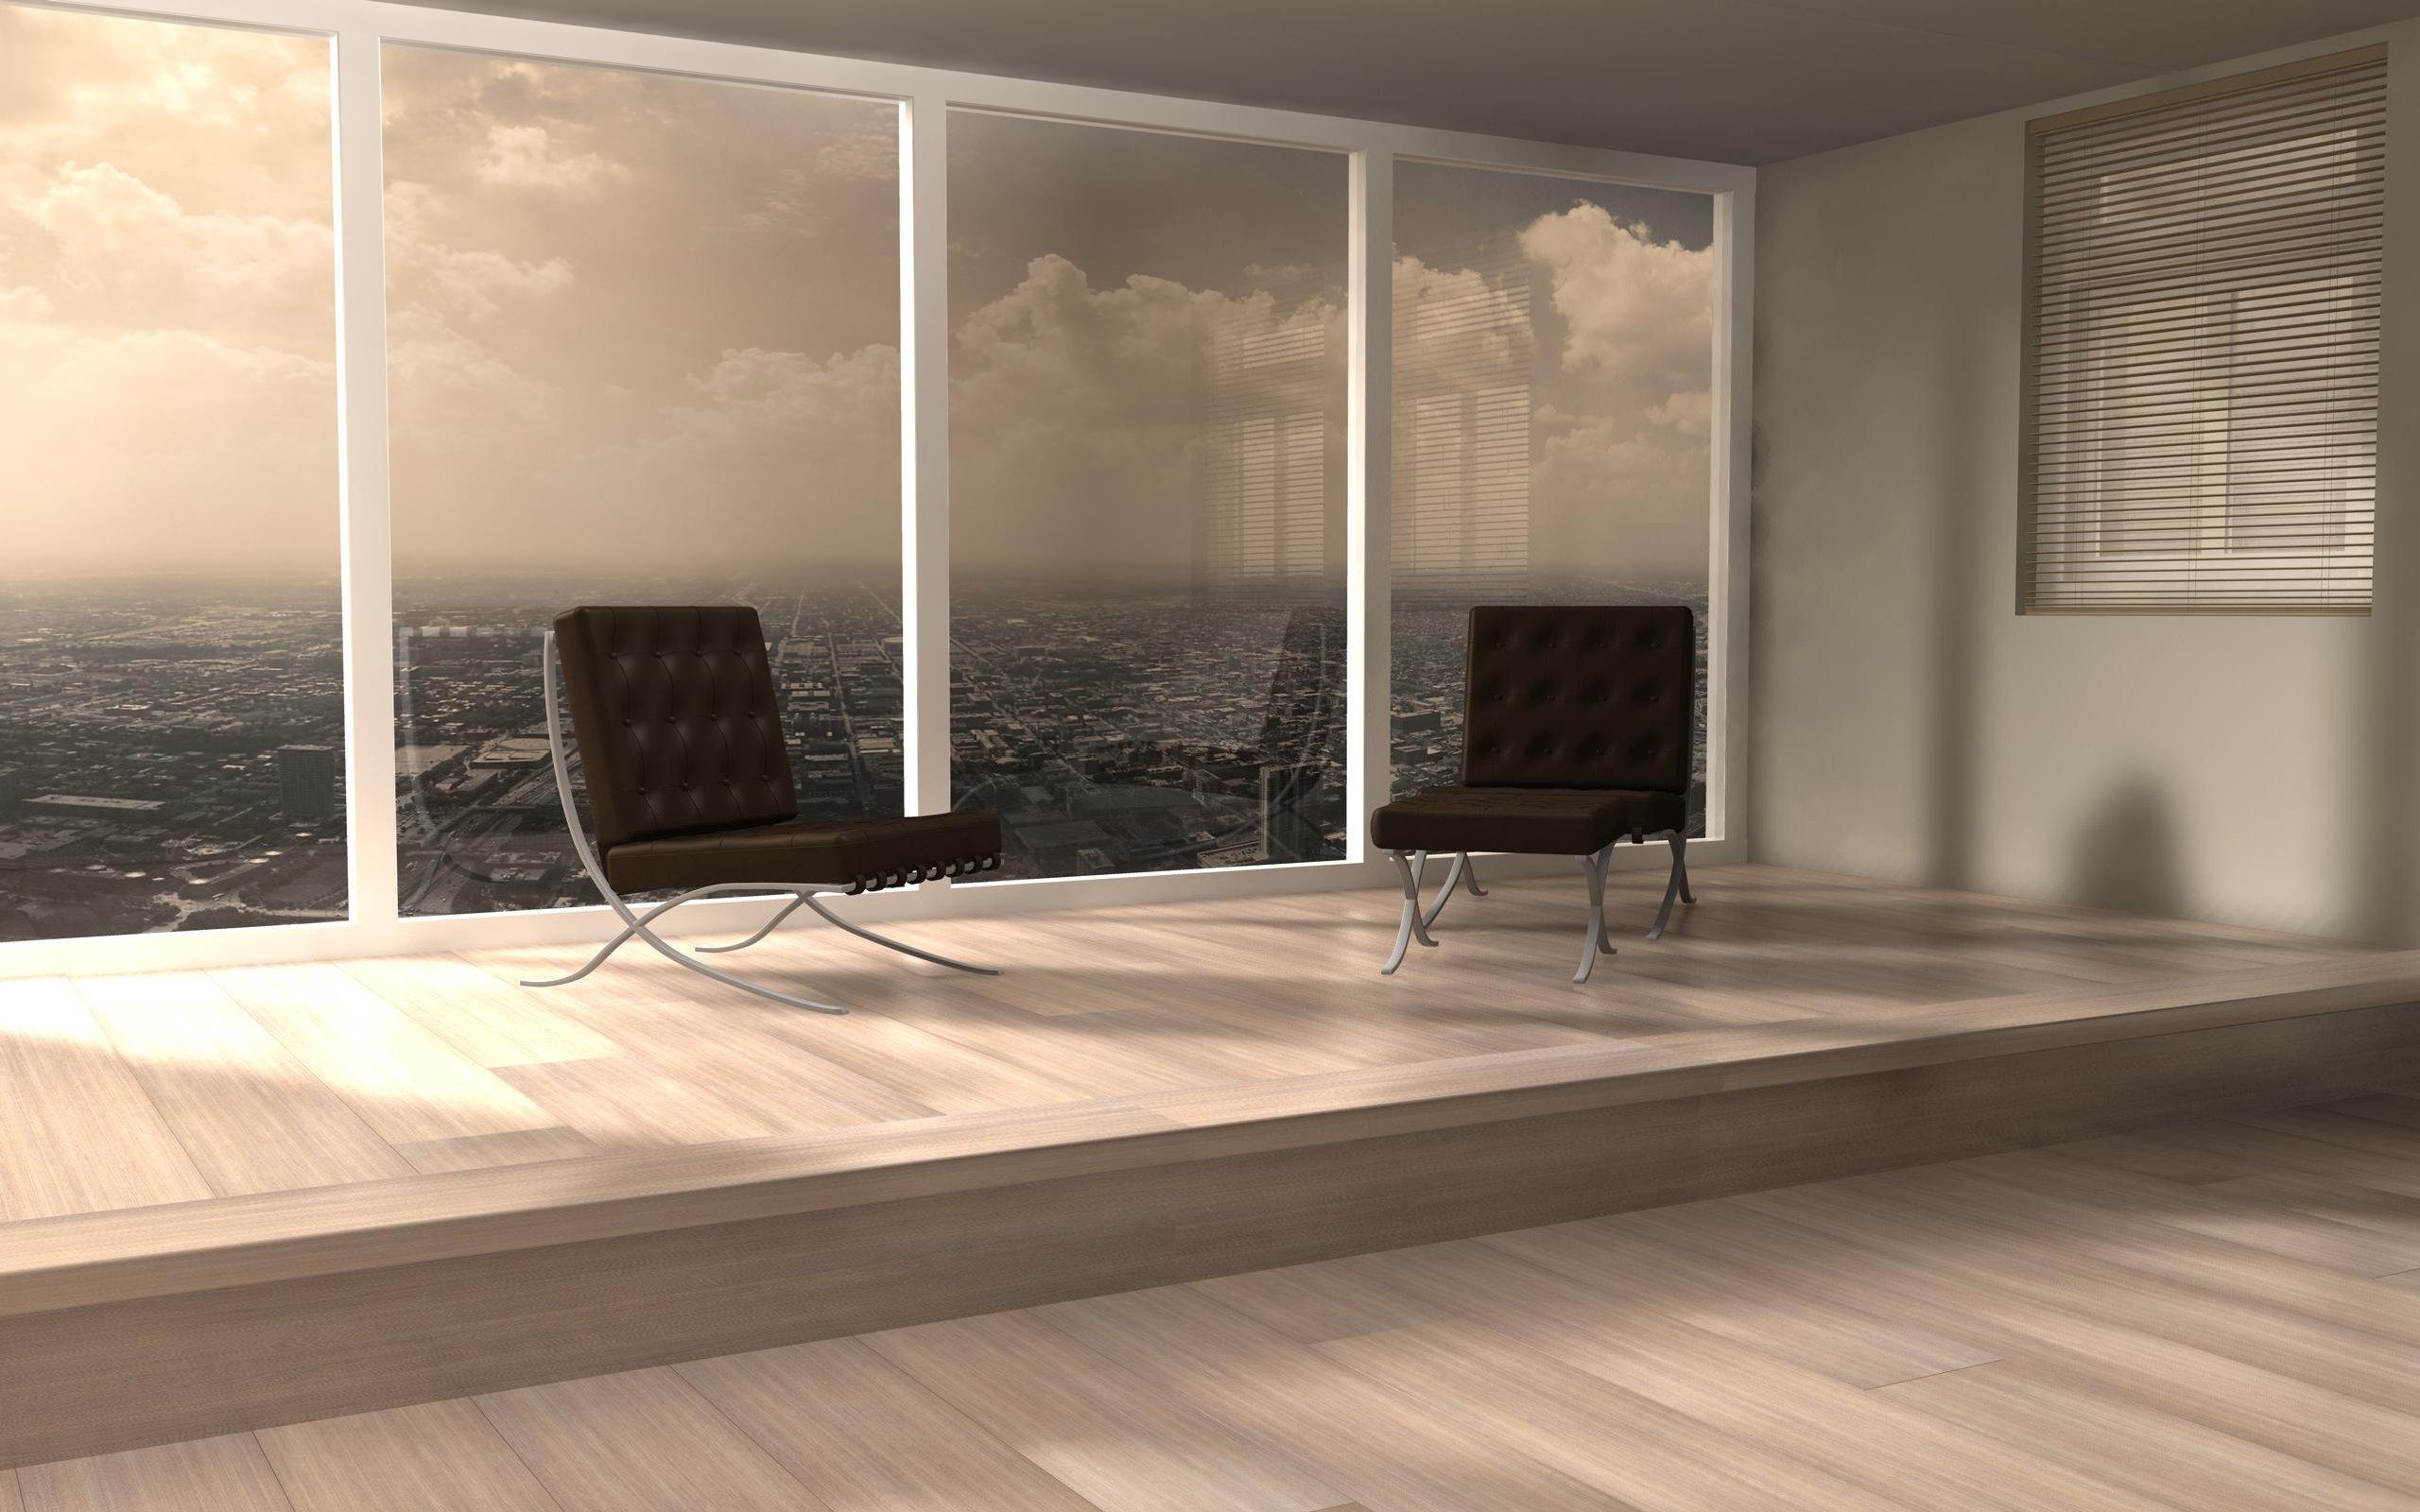 Free Download Top Office Desktop Background Images For